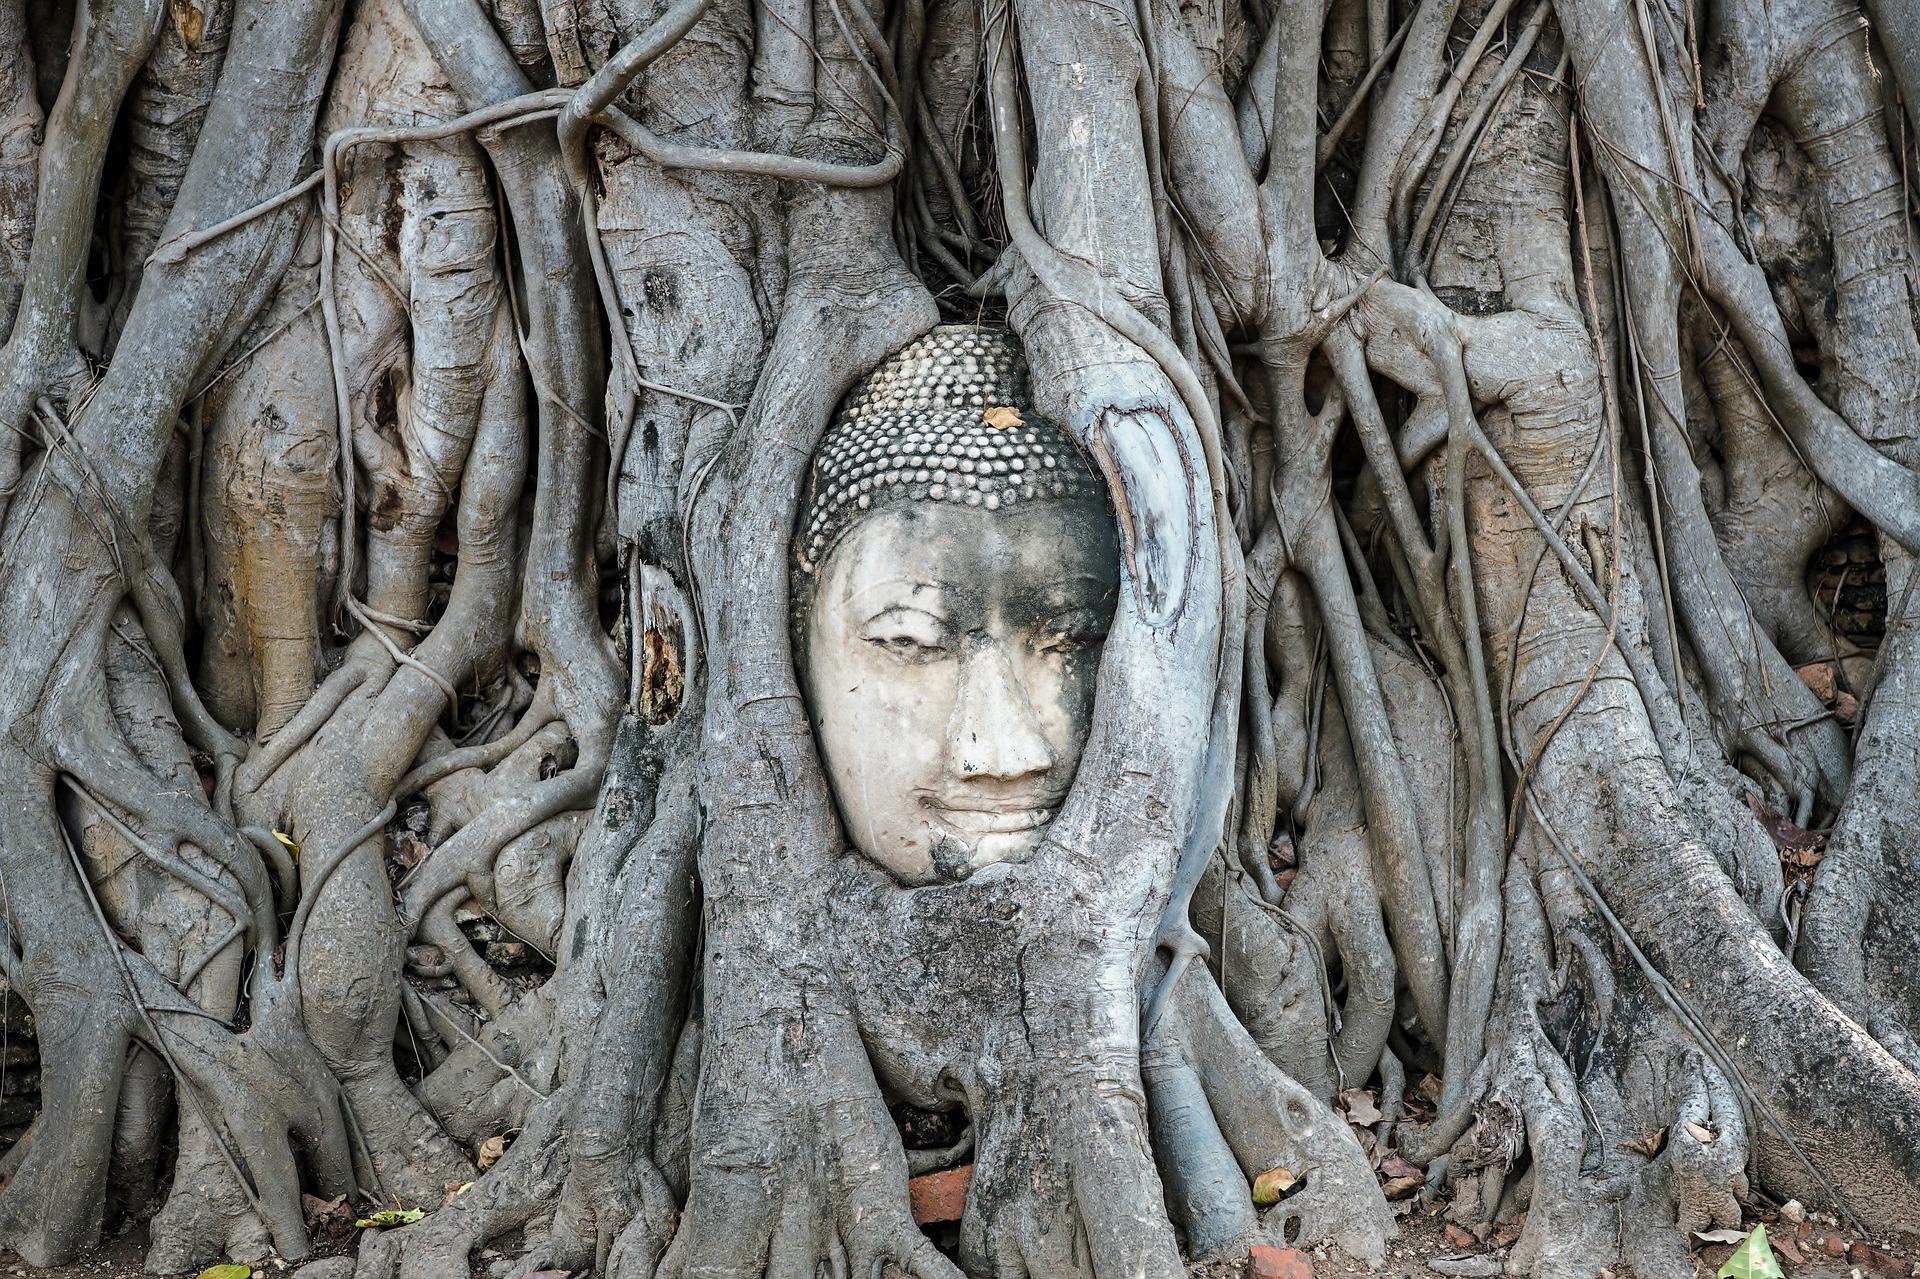 mahathat_tête_bouddha_racines_arbre_ayutthaya_khmer_thaïlande_asie_bangkok